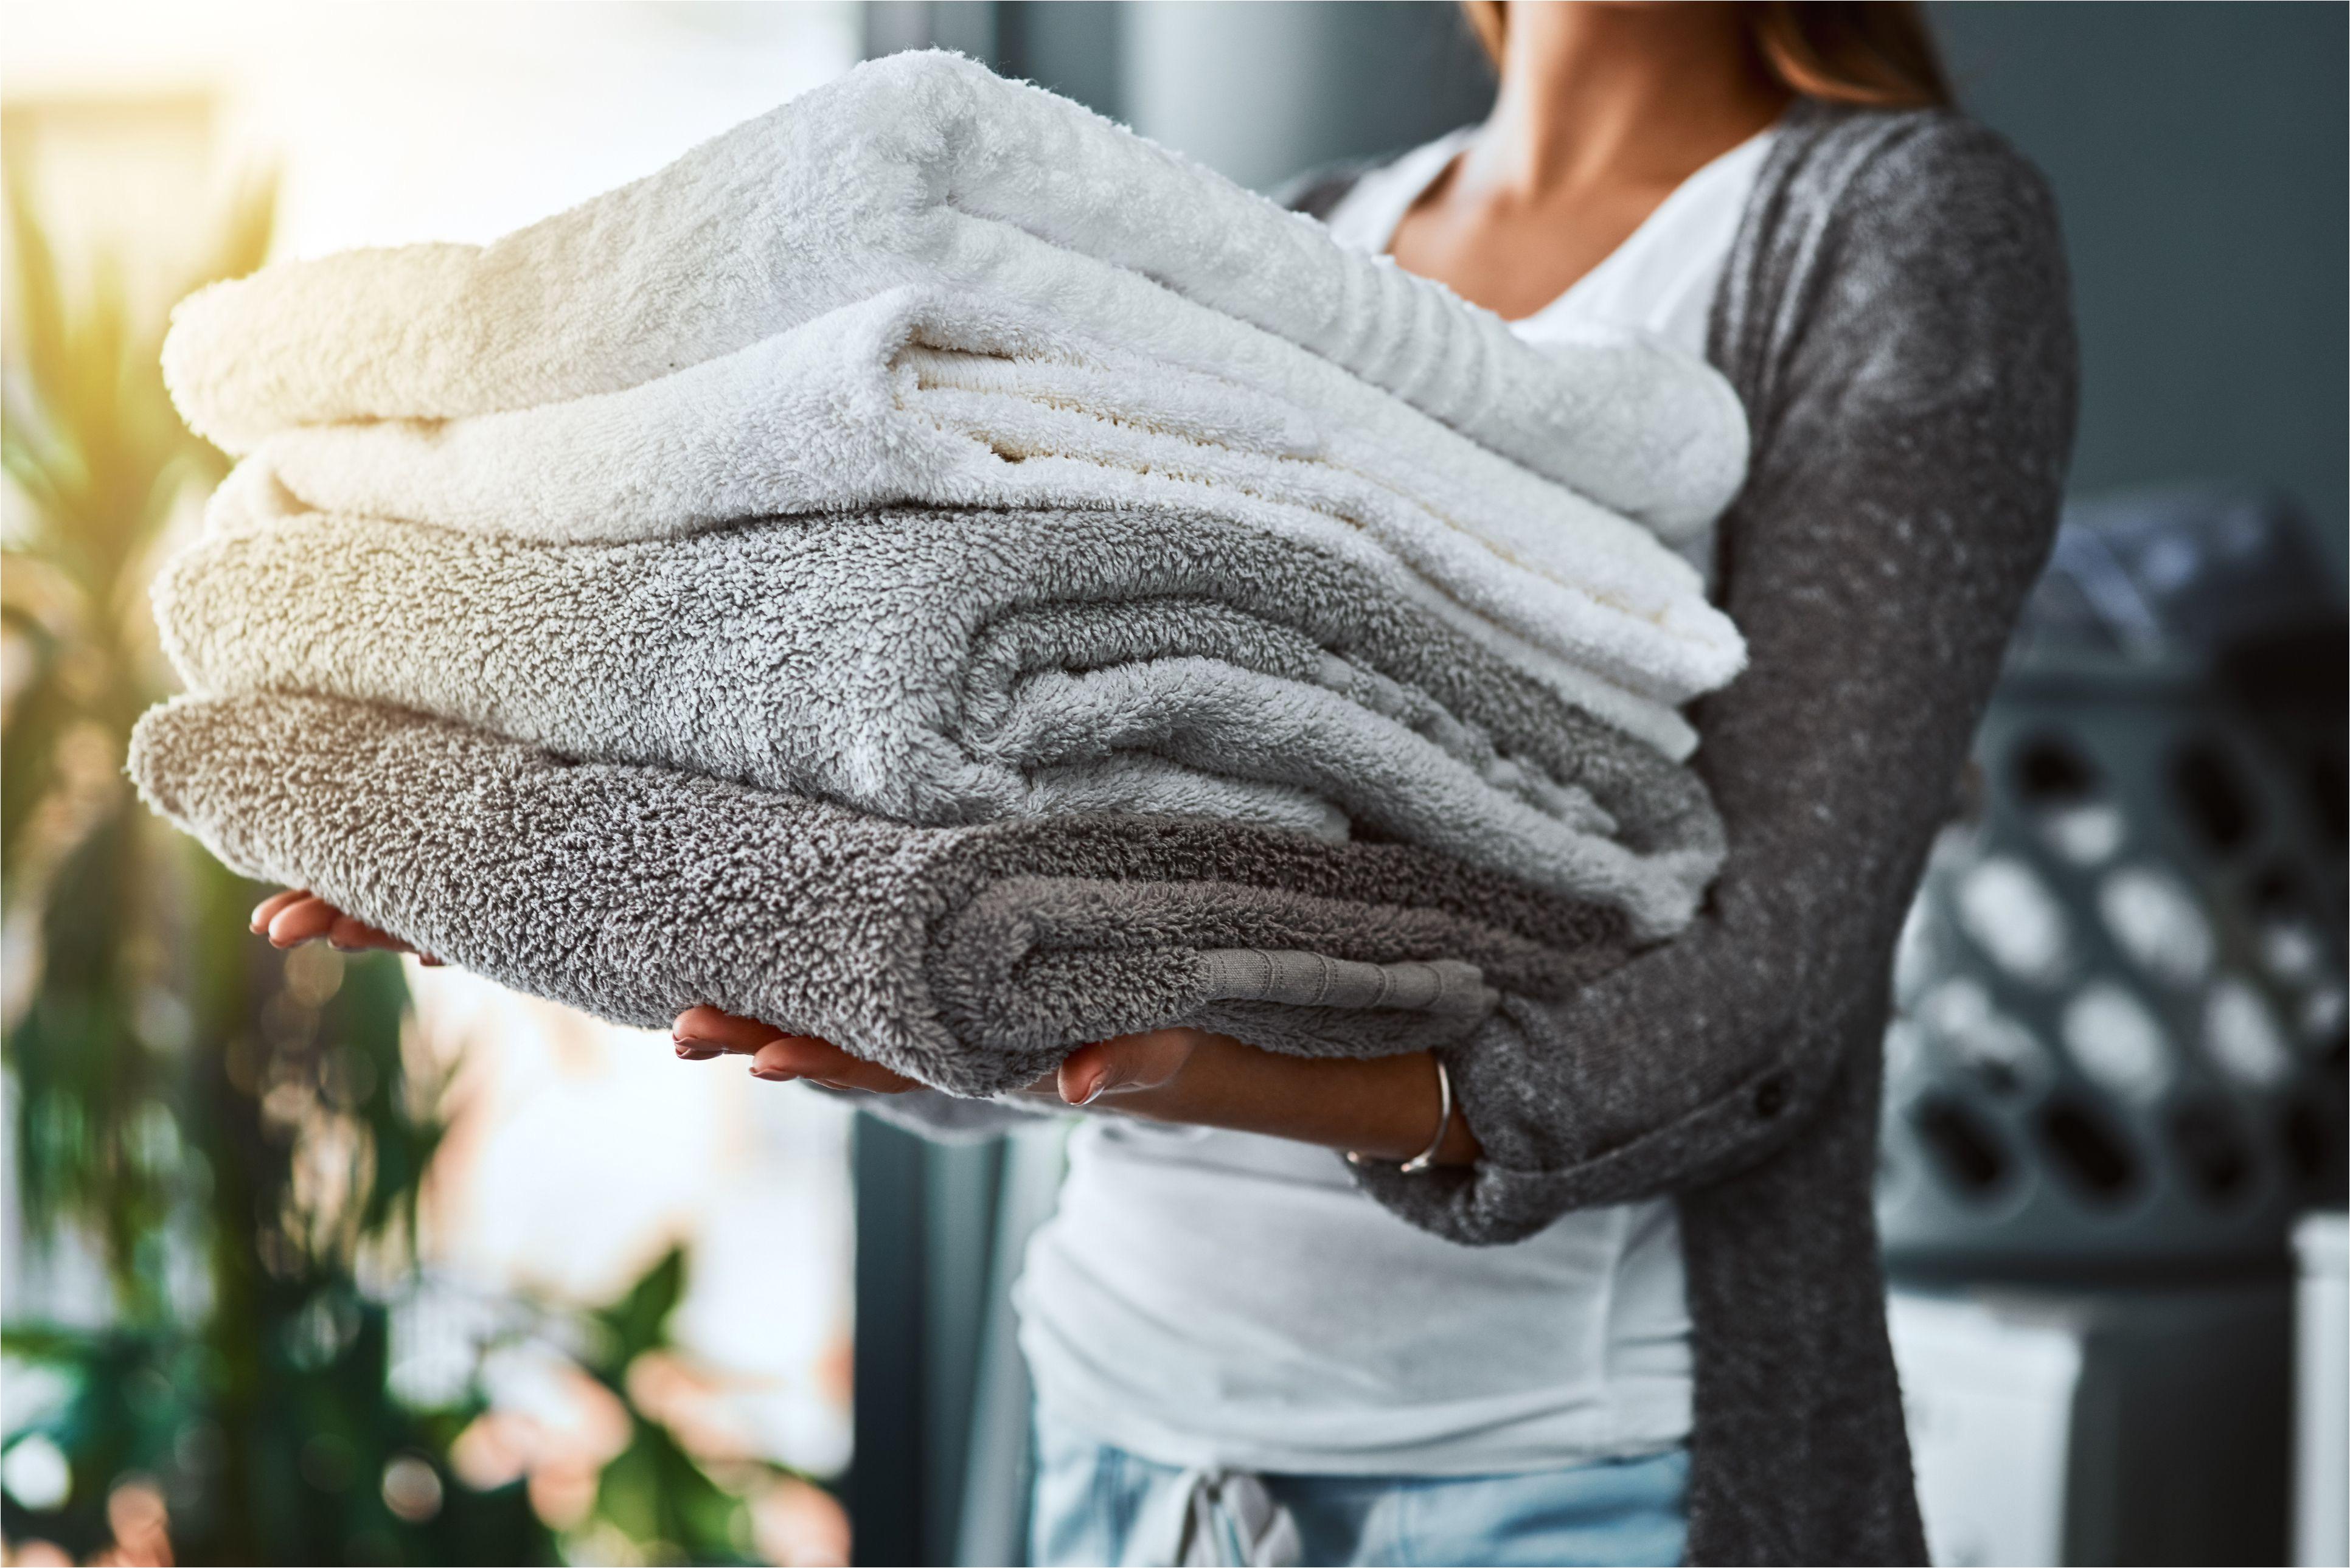 mission accomplished fresh and clean towels 912932336 5b6e4c21c9e77c0050c18058 jpg